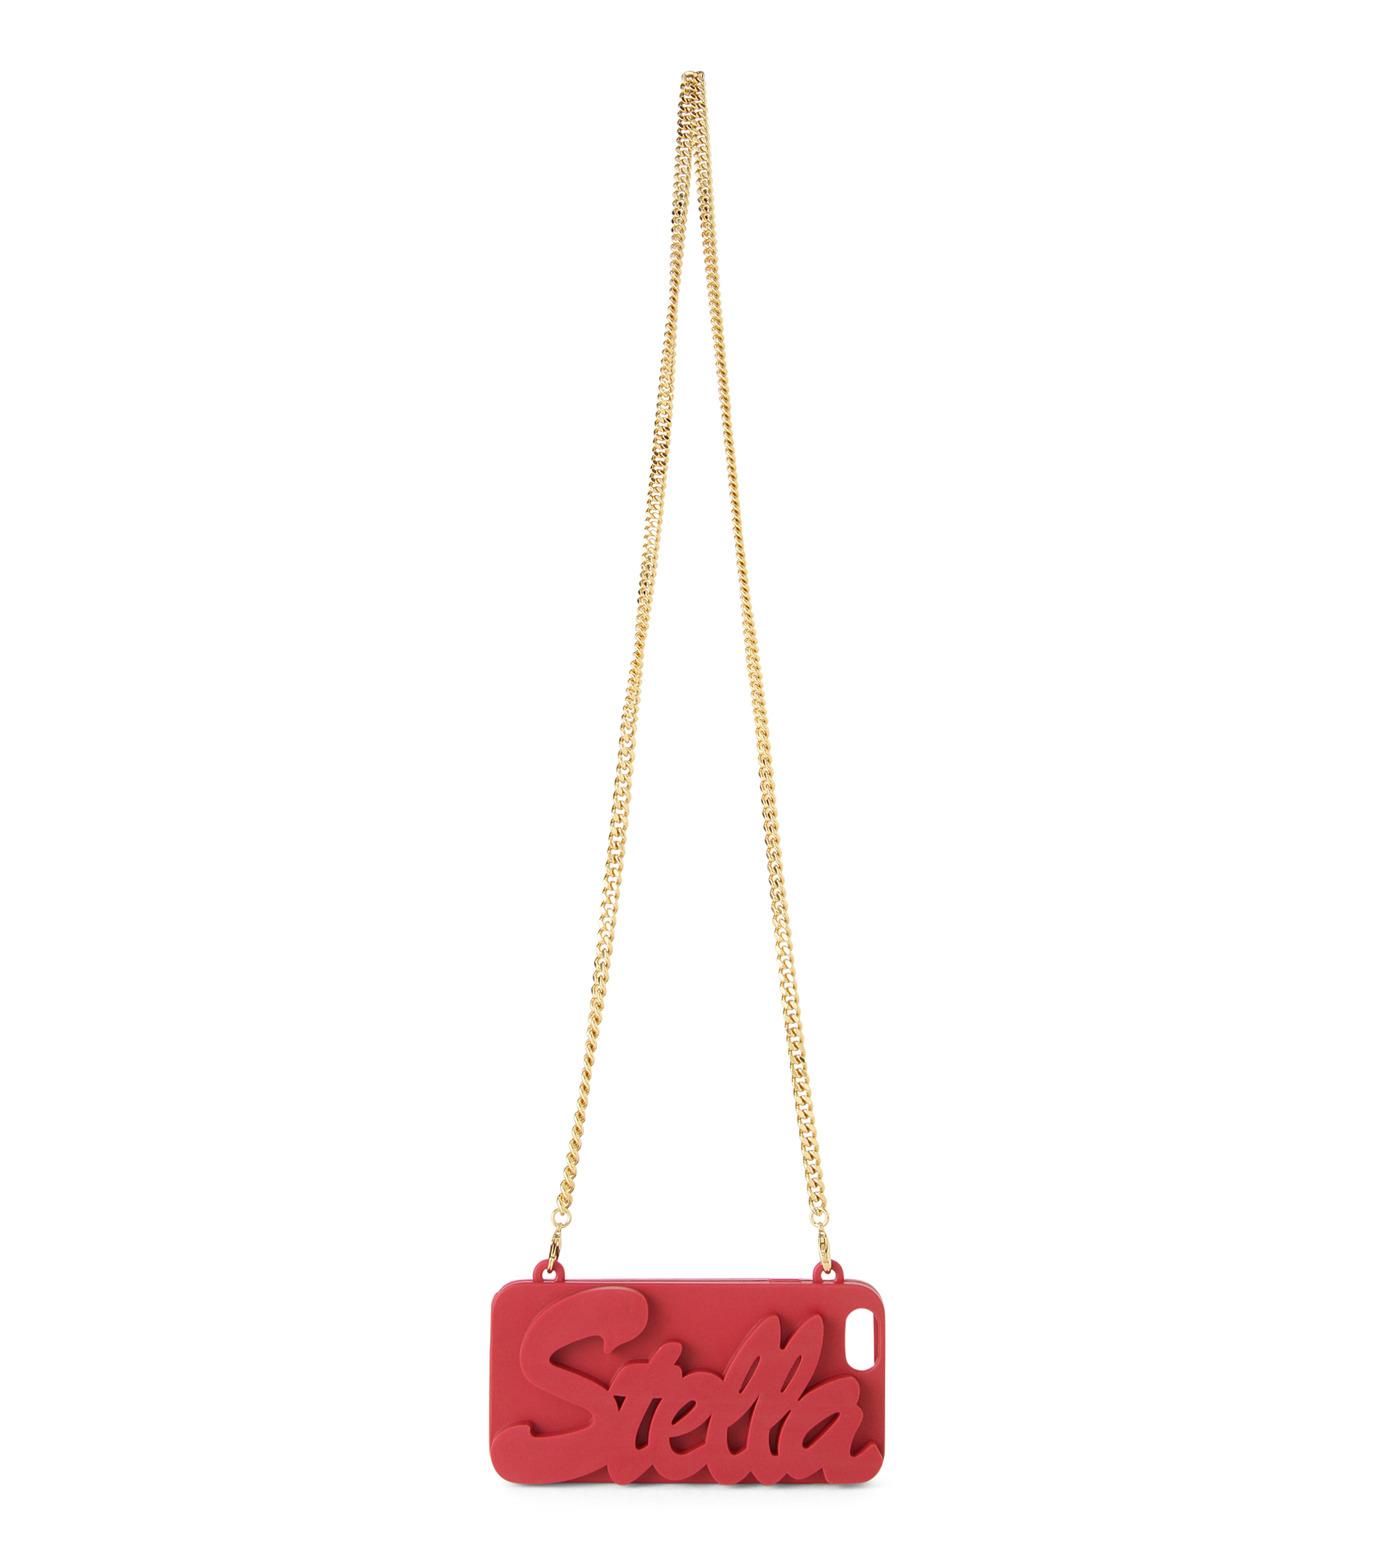 Stella McCartney(ステラマッカートニー)のiPhone6 Case Stella-PINK(ケースiphone6/6s/case iphone6/6s)-397935-W9589-72 拡大詳細画像3